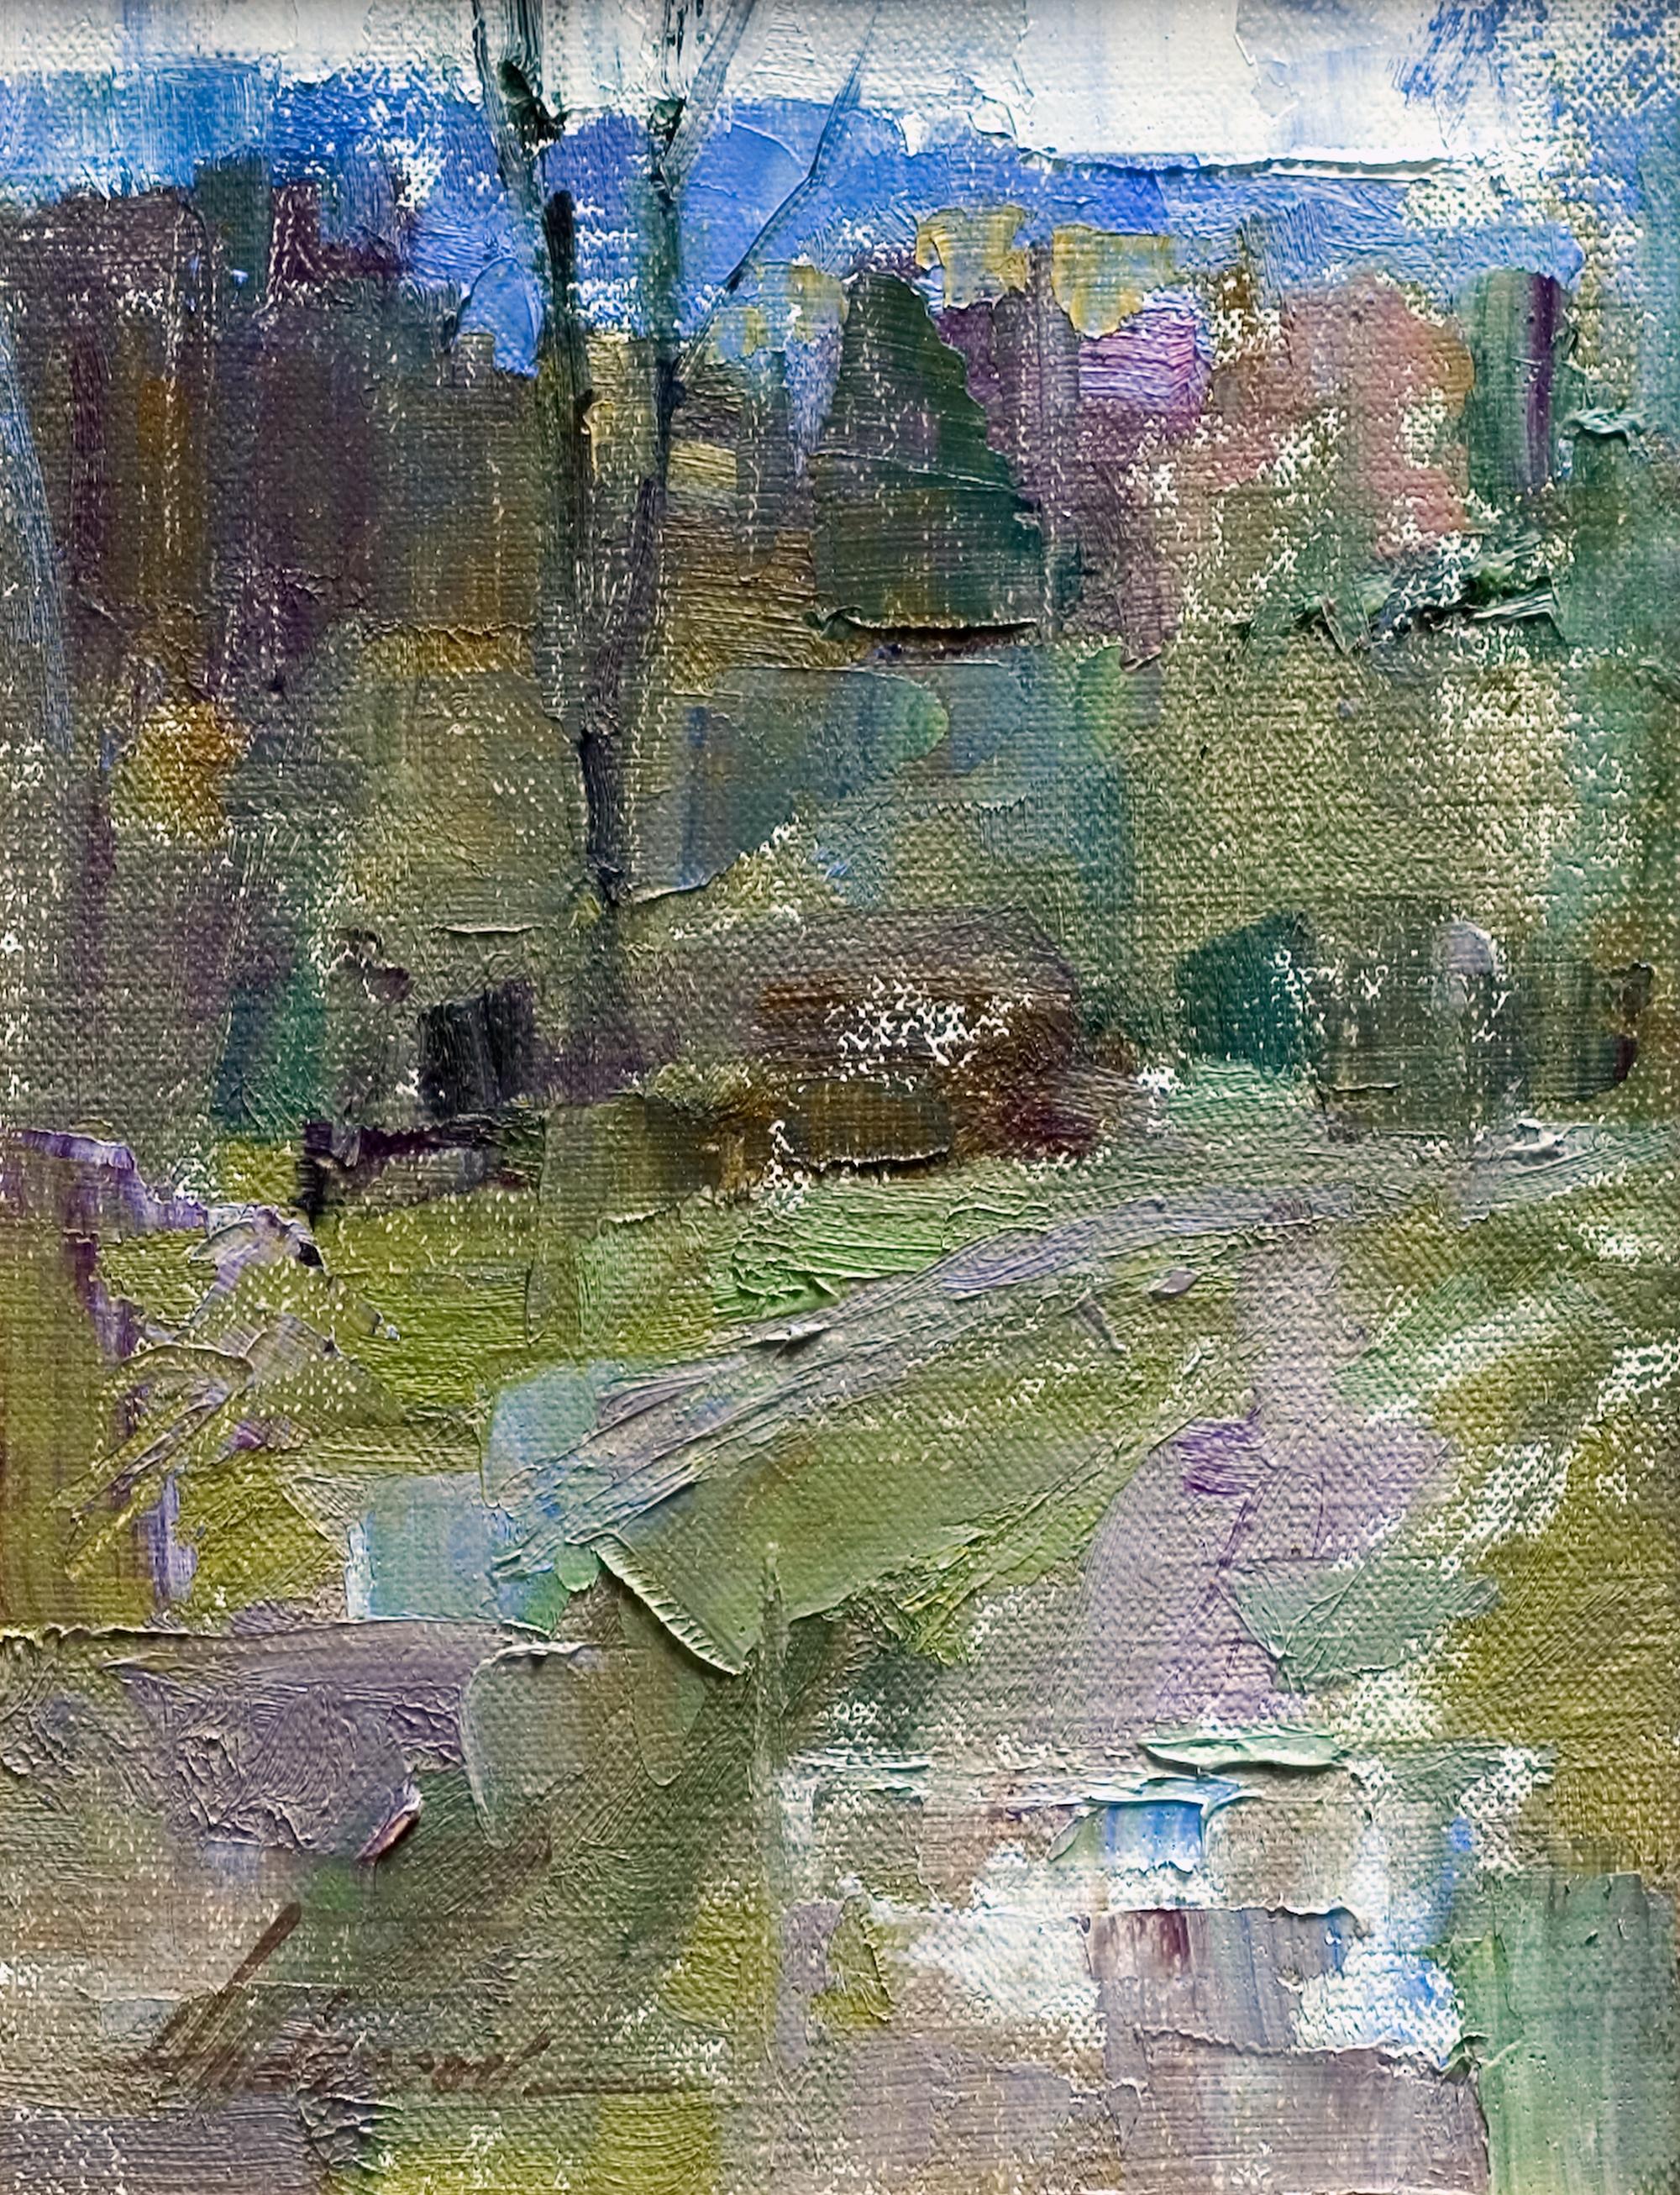 Landscape Study by Carolyn Anderson